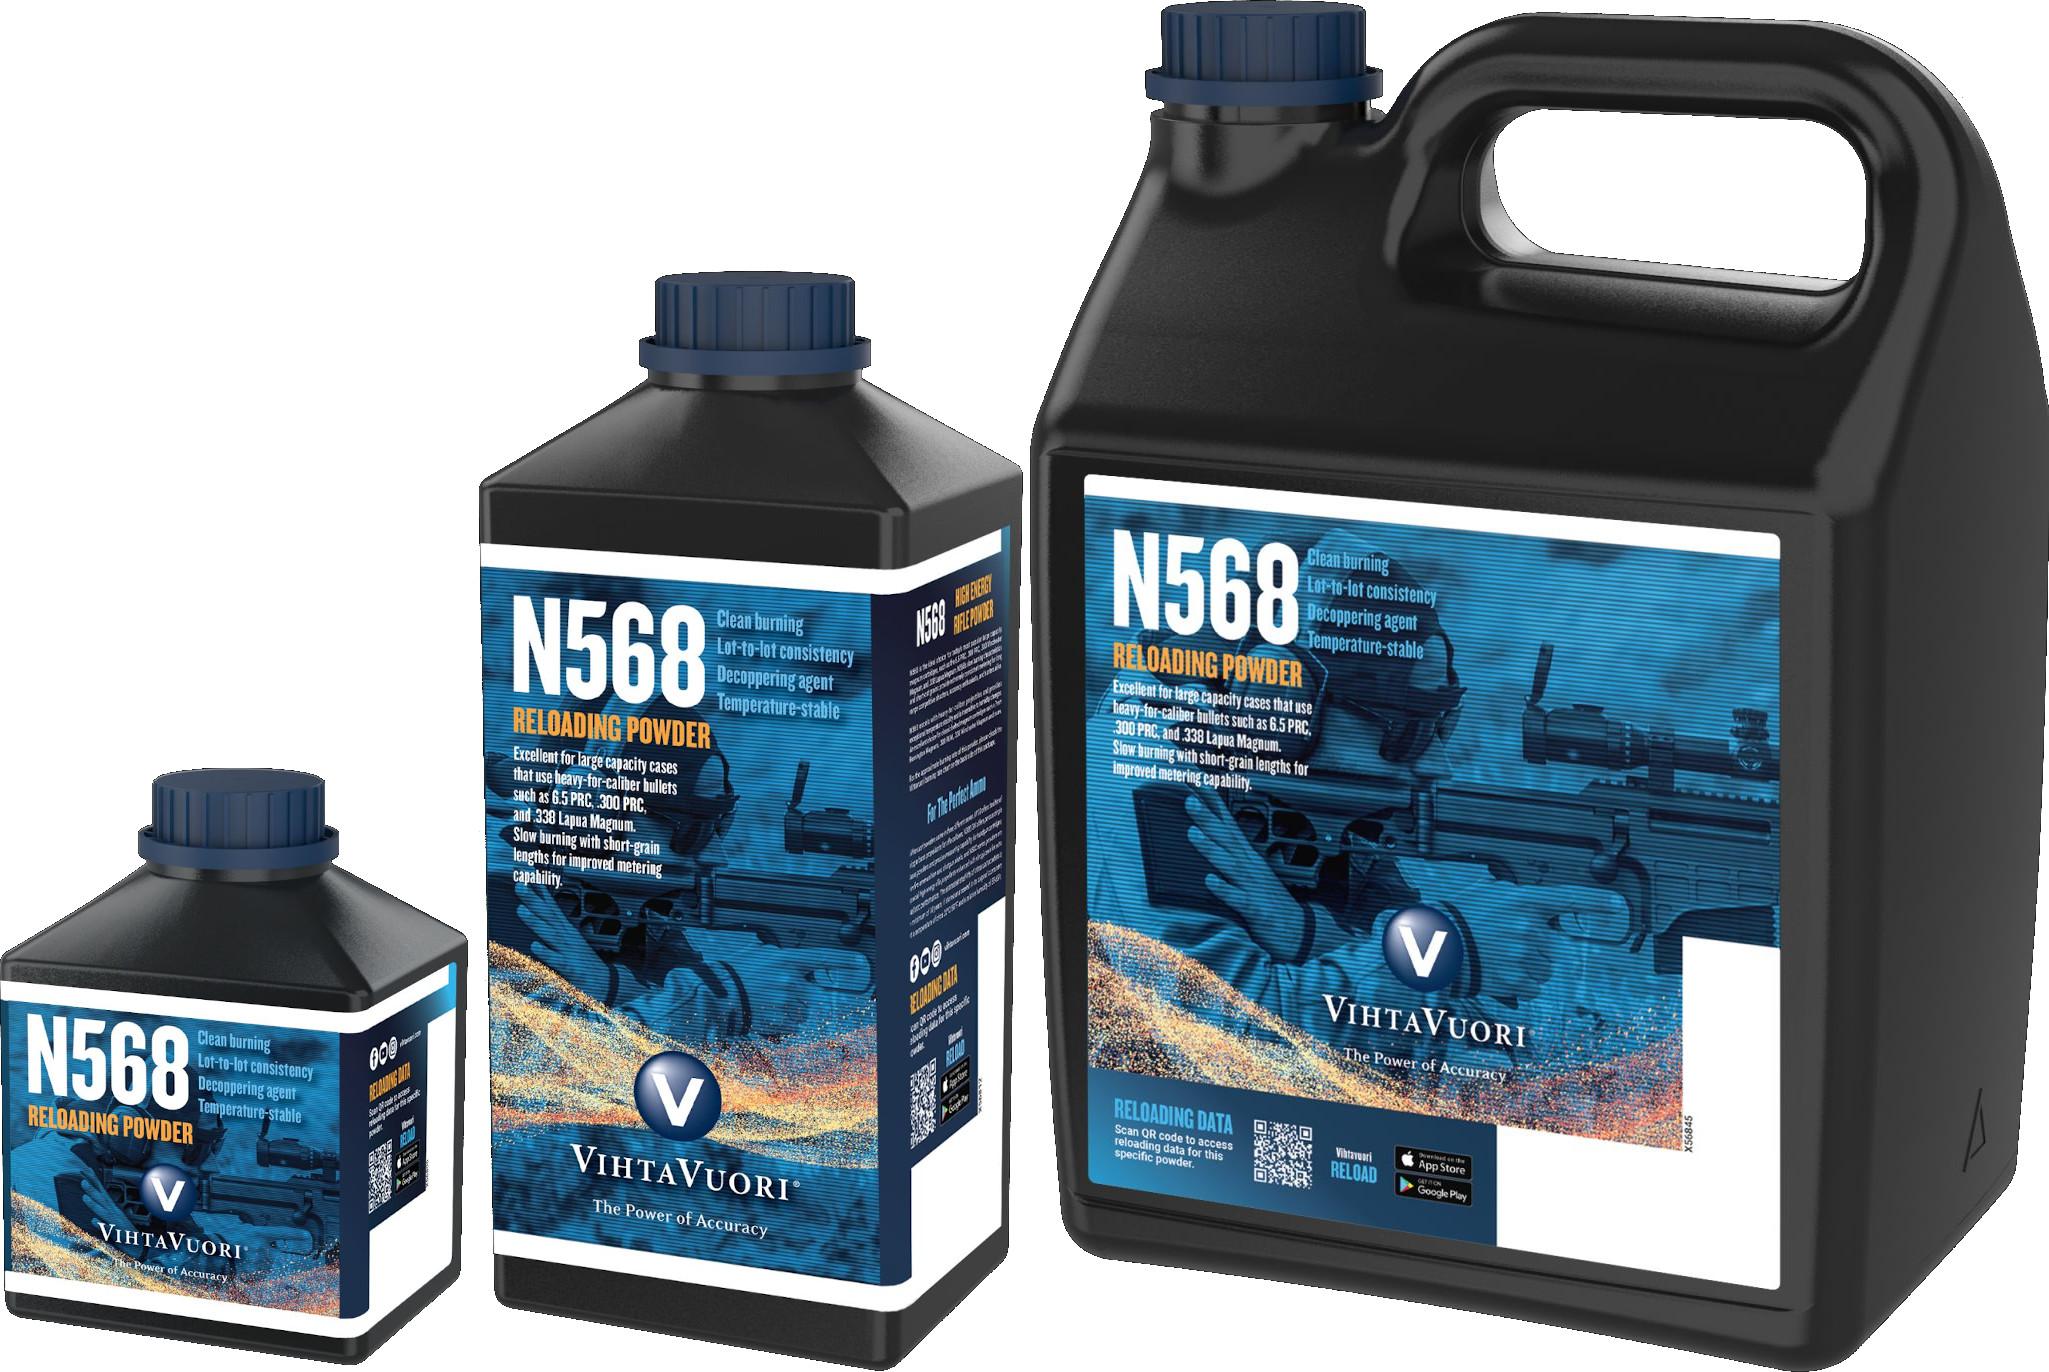 Vihtavuori N568 high energy powder